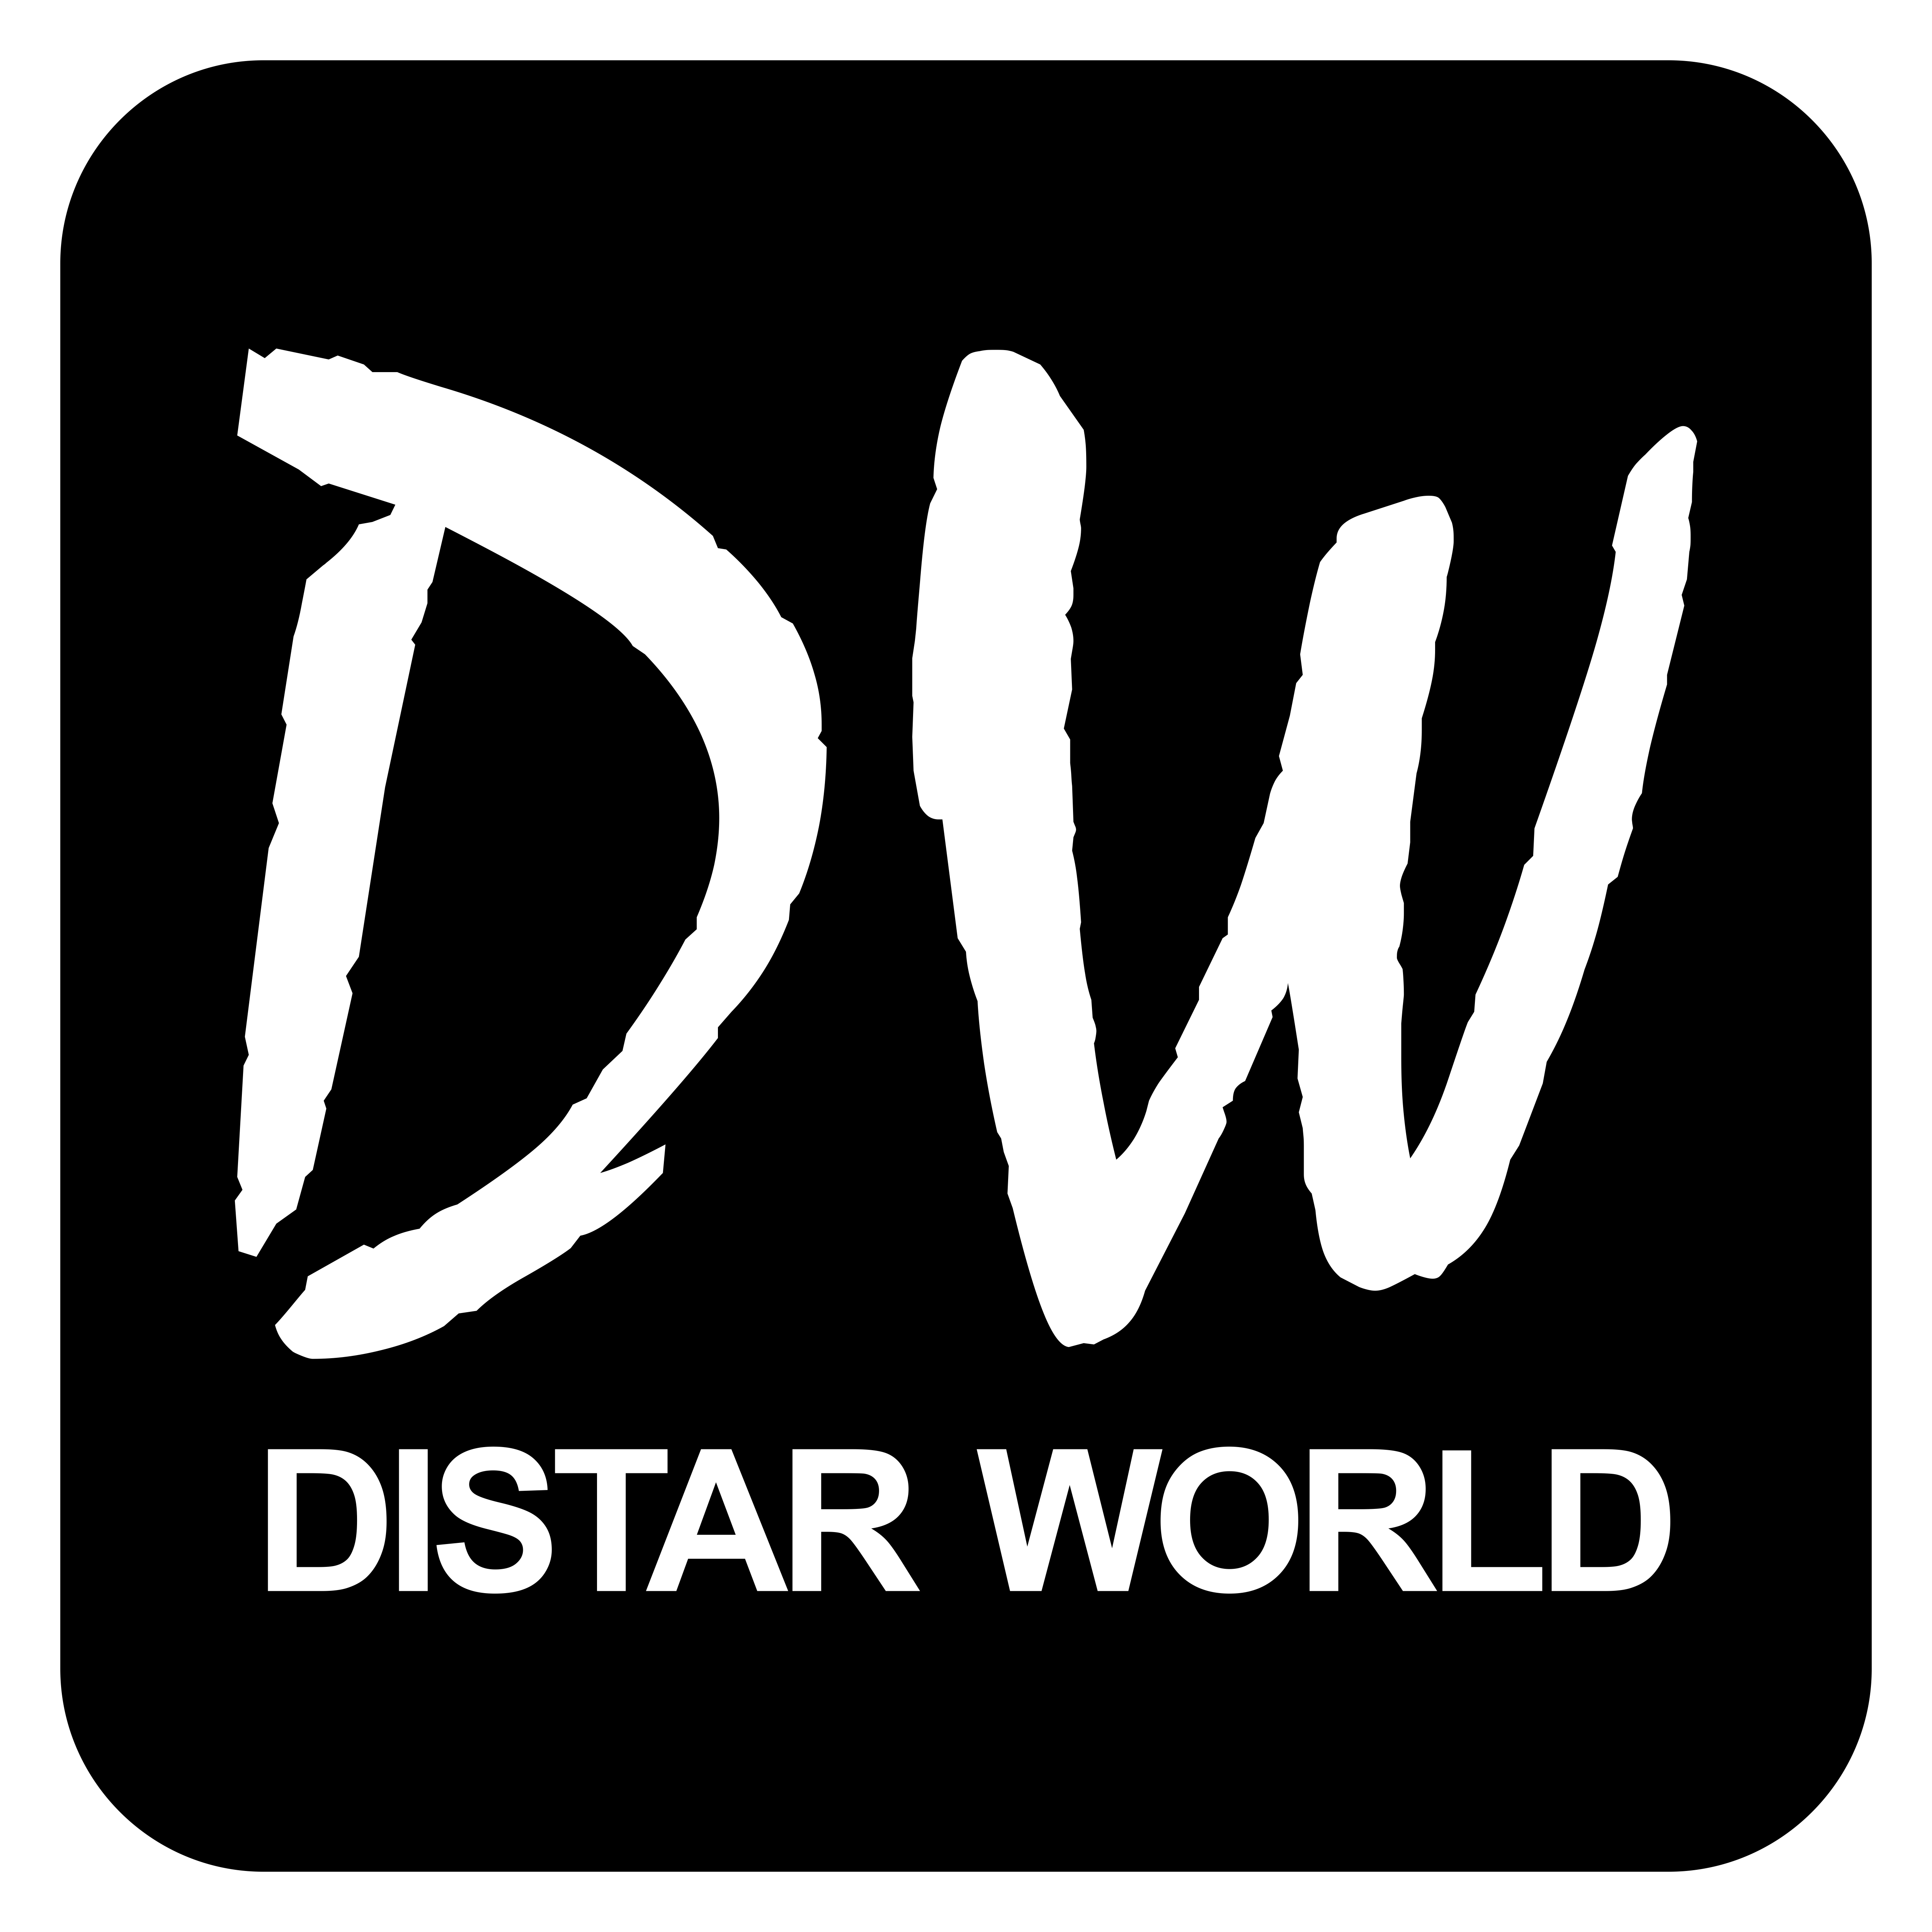 Distar World